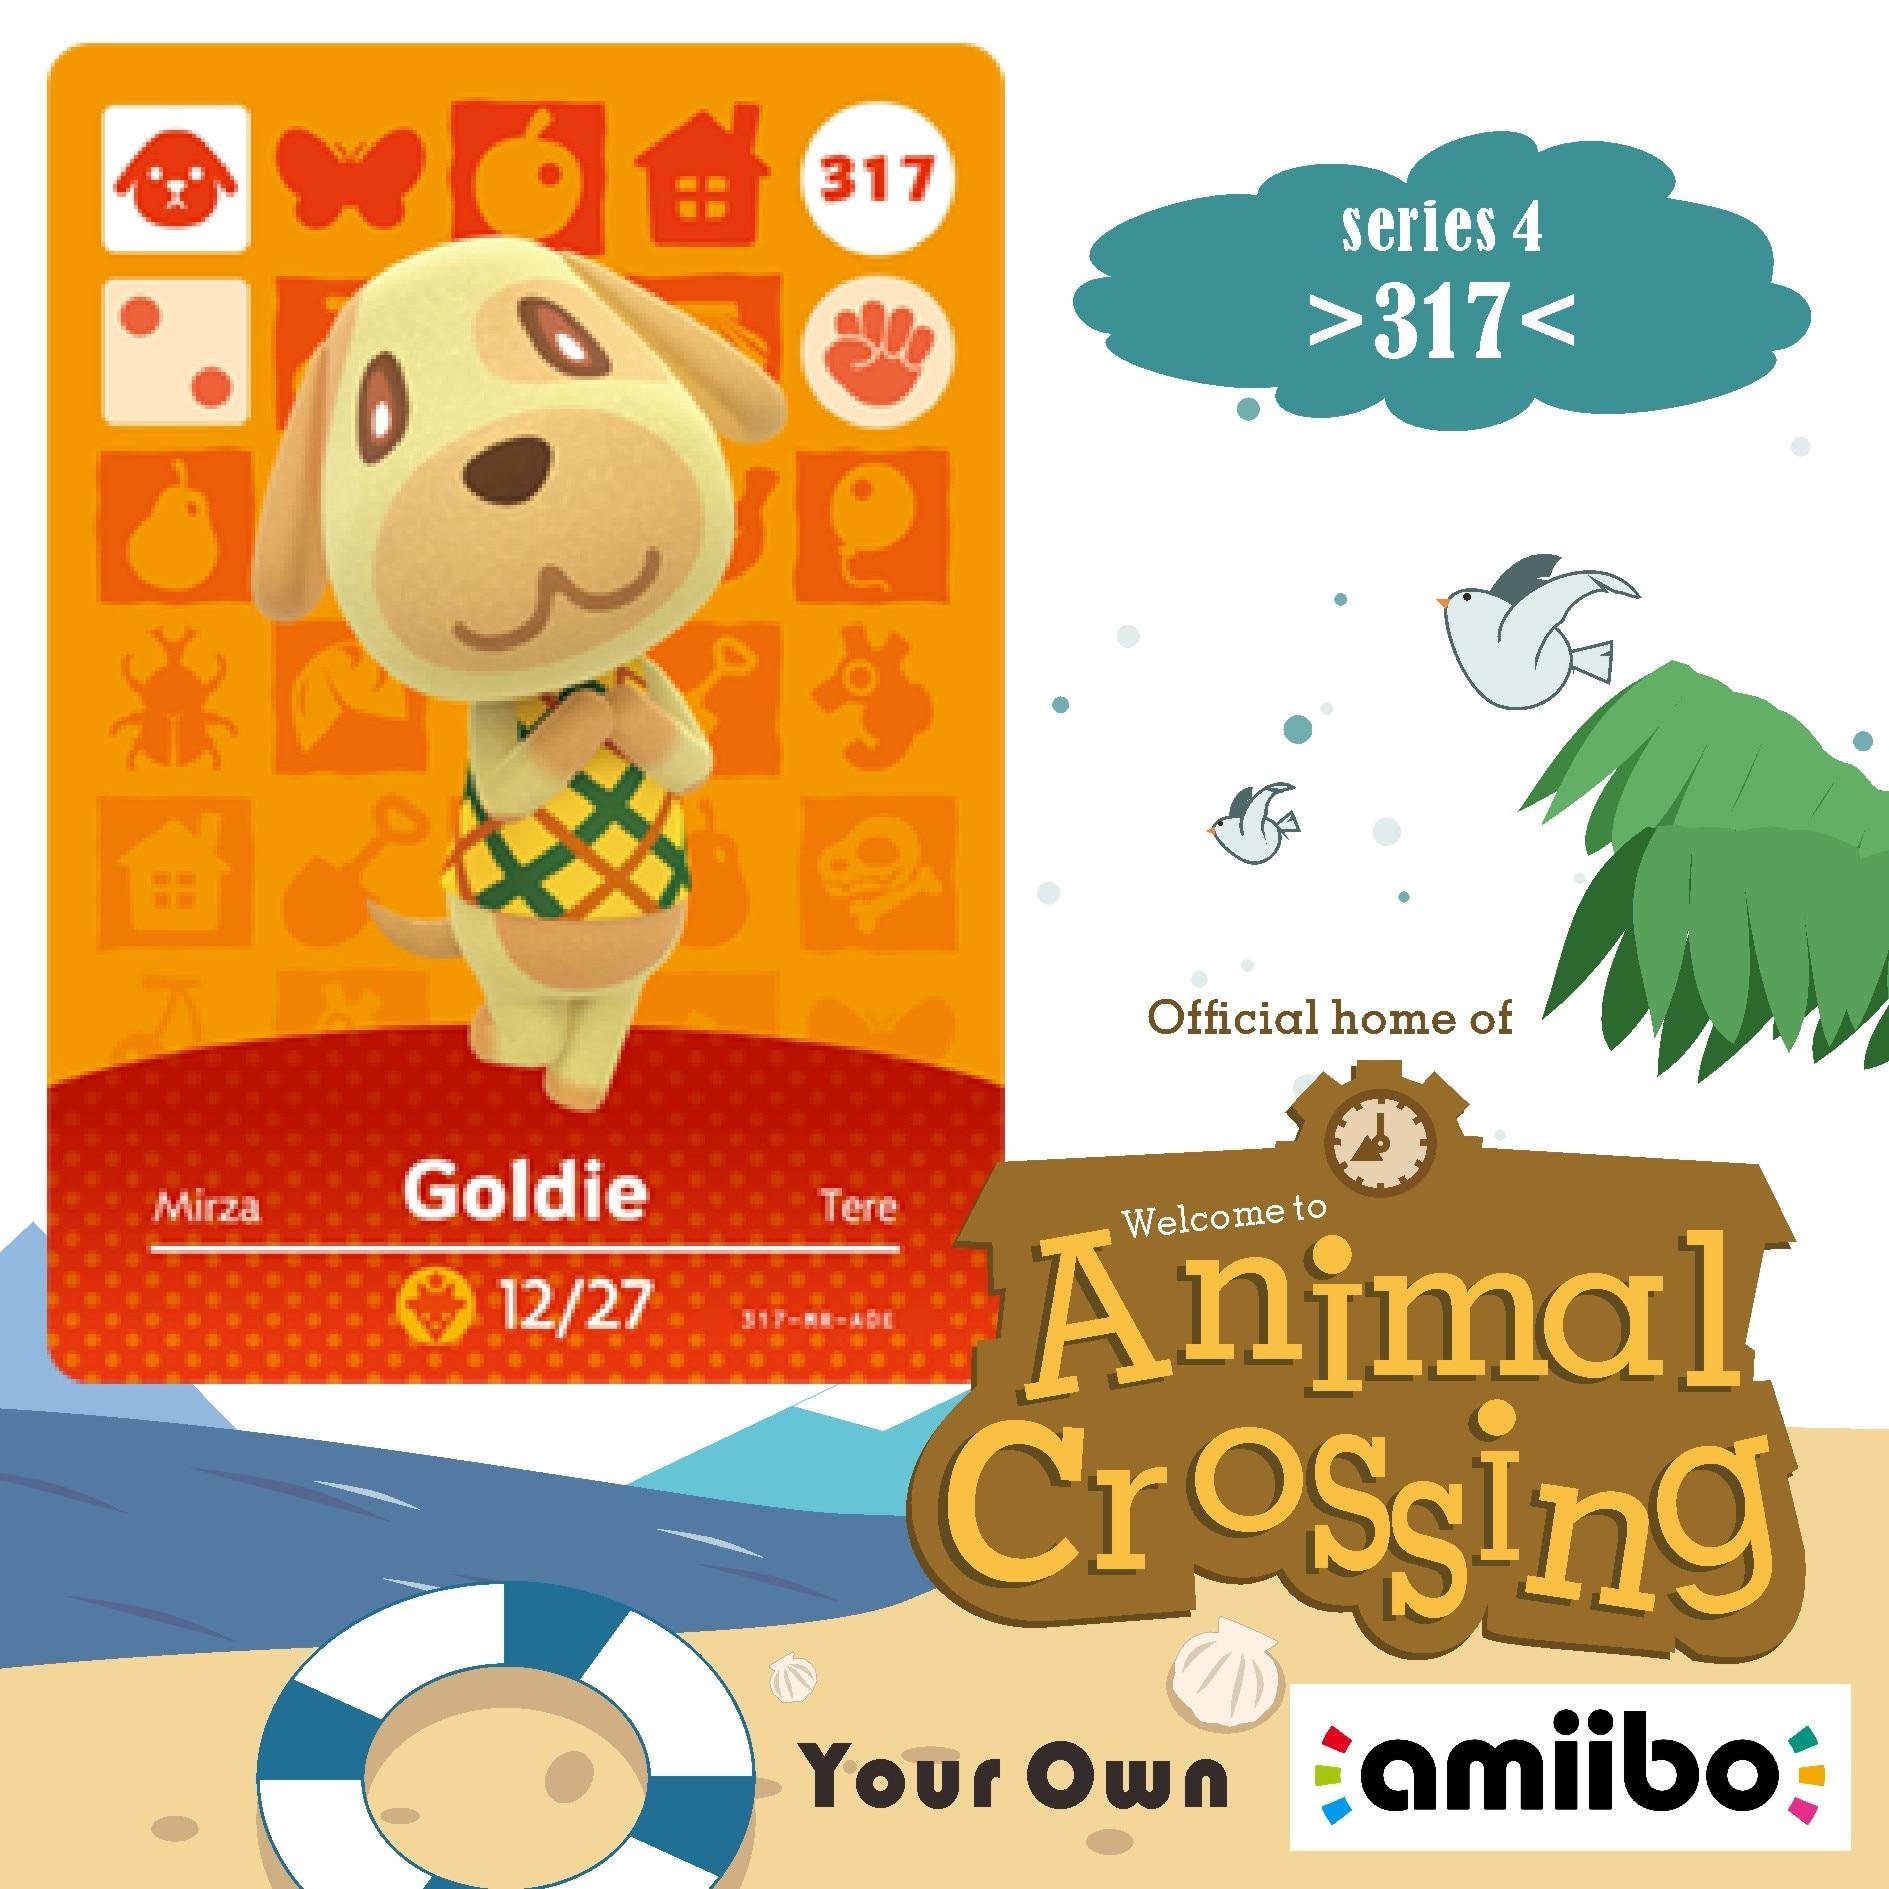 Amiibo Animal Crossing 317 Animal Crossing Amiibo Card Goldie Amiibo Goldie Cross Game Villager Card Series 4 317  Goldie 1